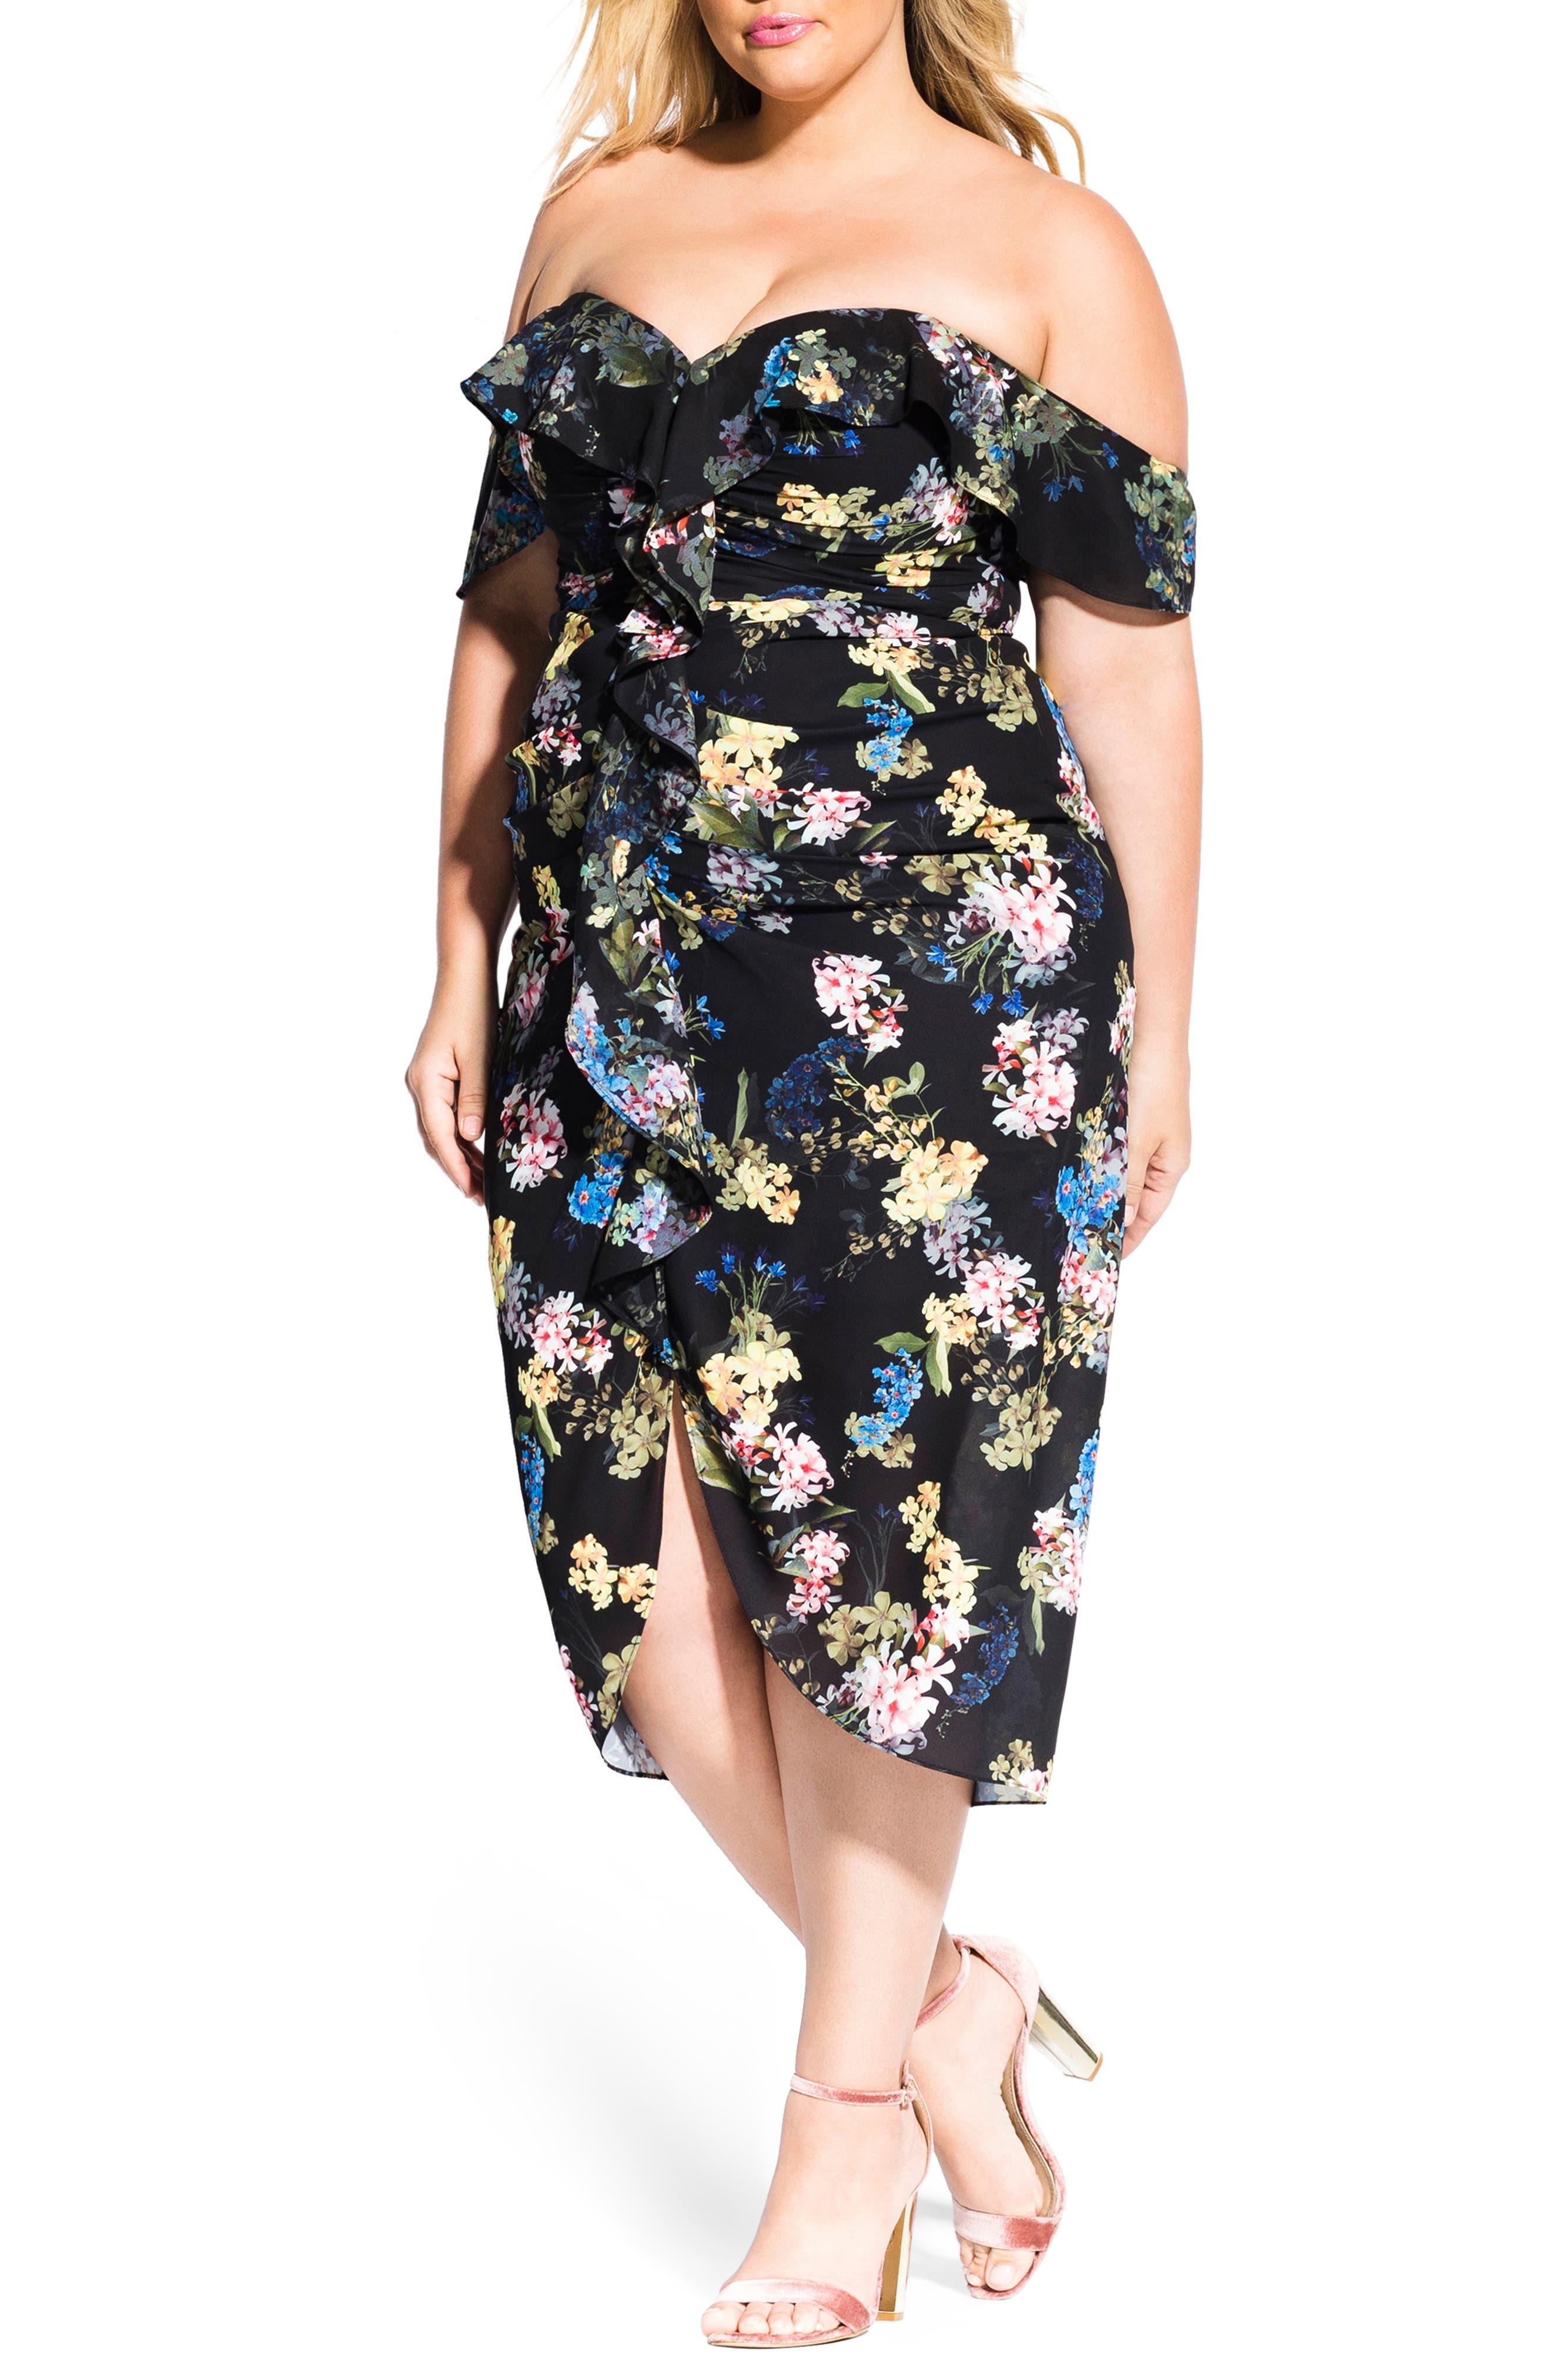 Plus Size City Chic Honey Suckle Midi Dress, Black